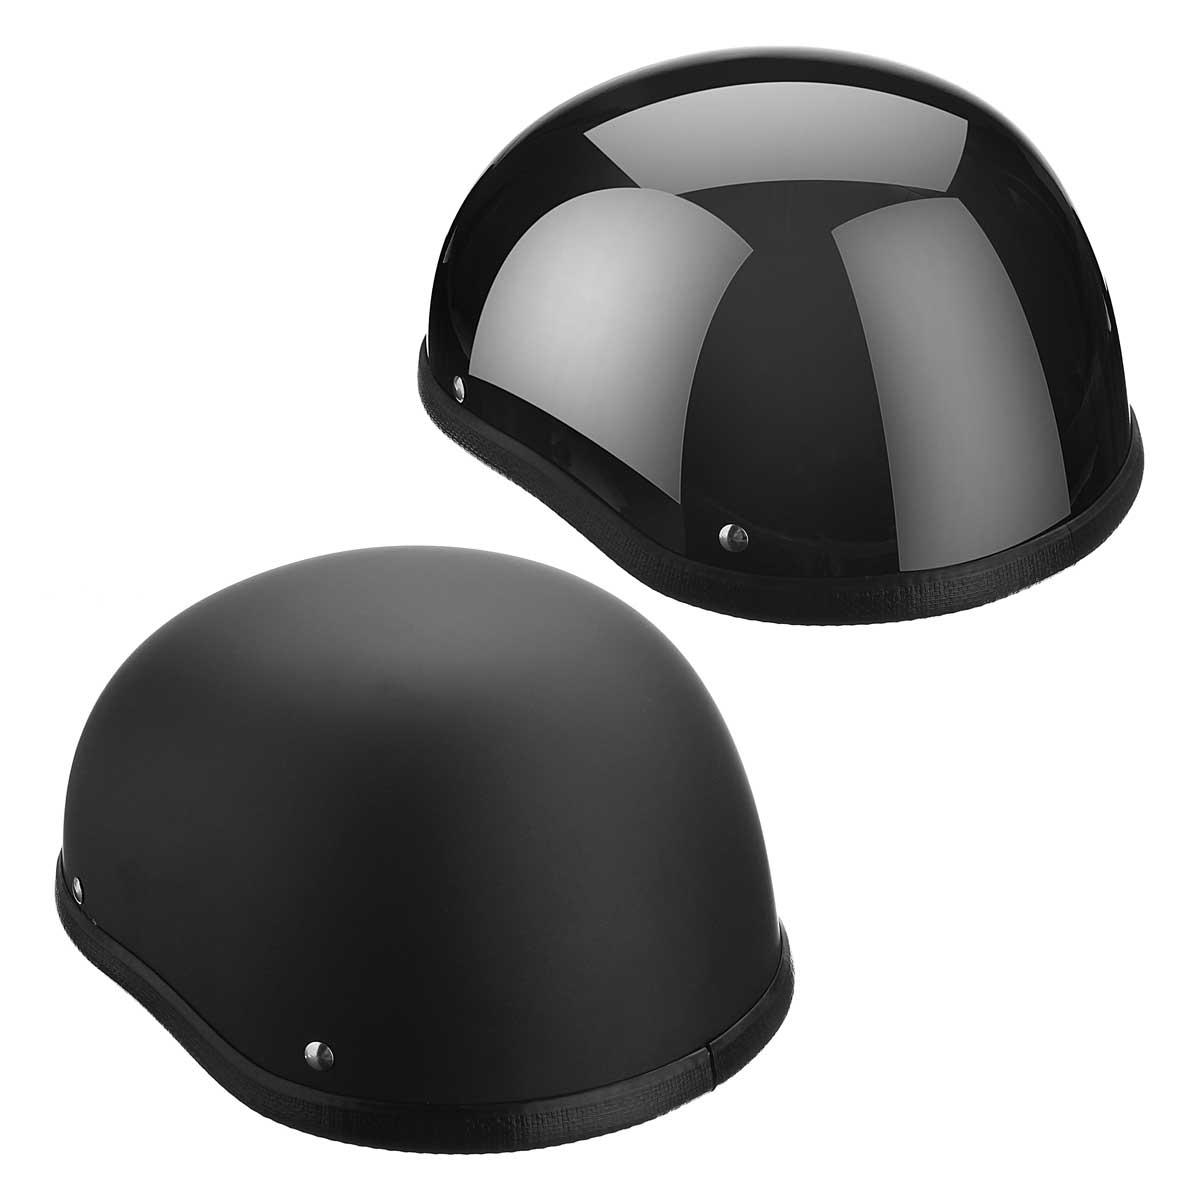 1 Stück Abs-kunststoff Motorrad Helm Motorcross Capacete Halb Helm für Harley Retro Matte Helle Schwarz